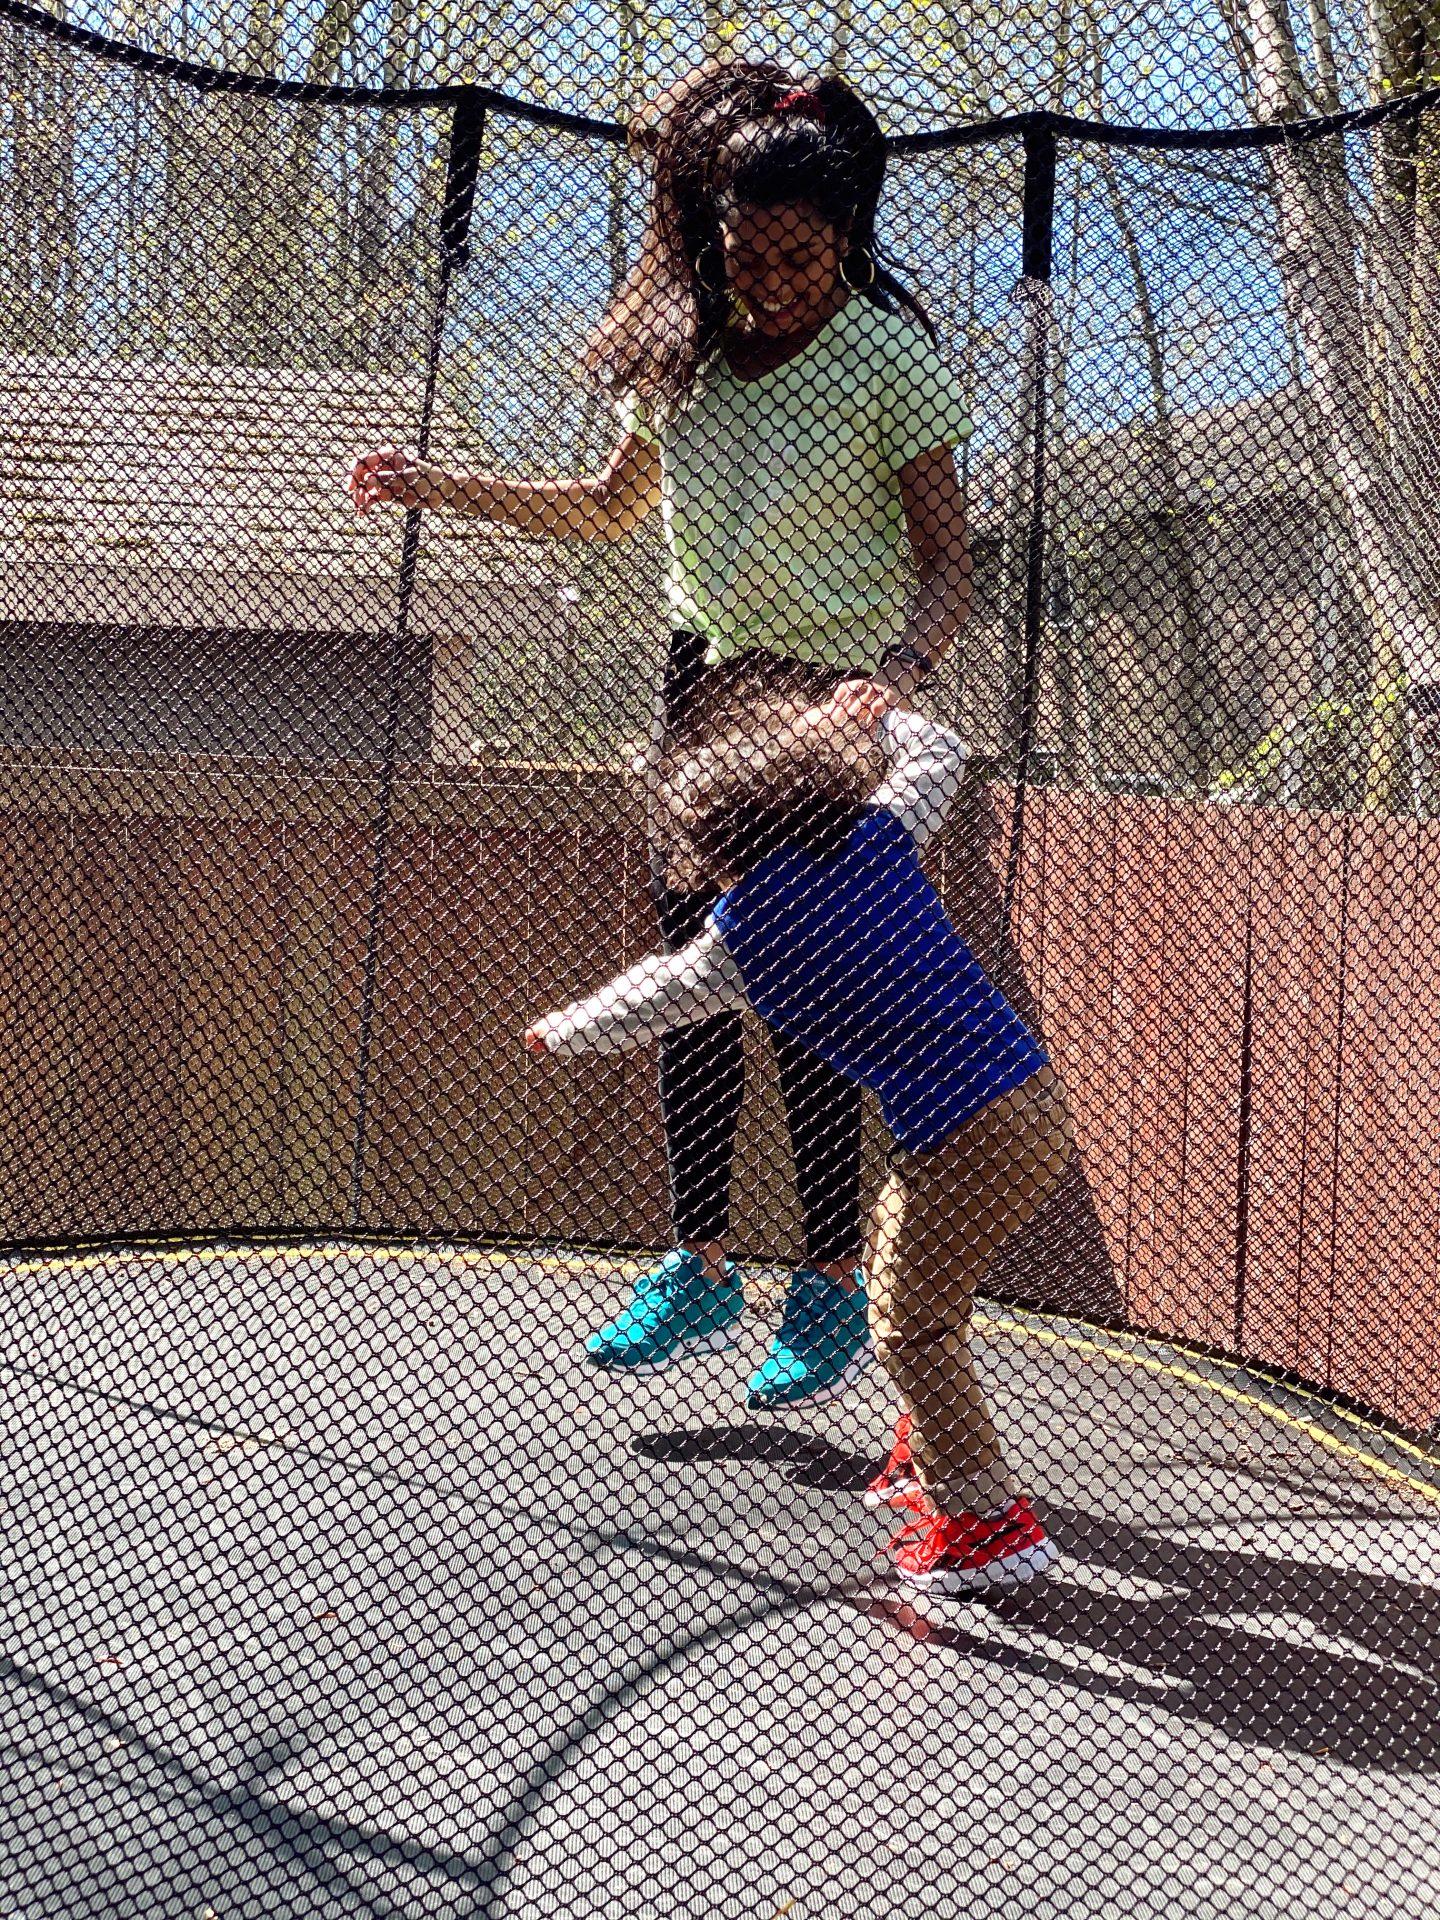 Coronavirus_Motherhood_parenting_dear_mom_you_are_not _alone_trampoline